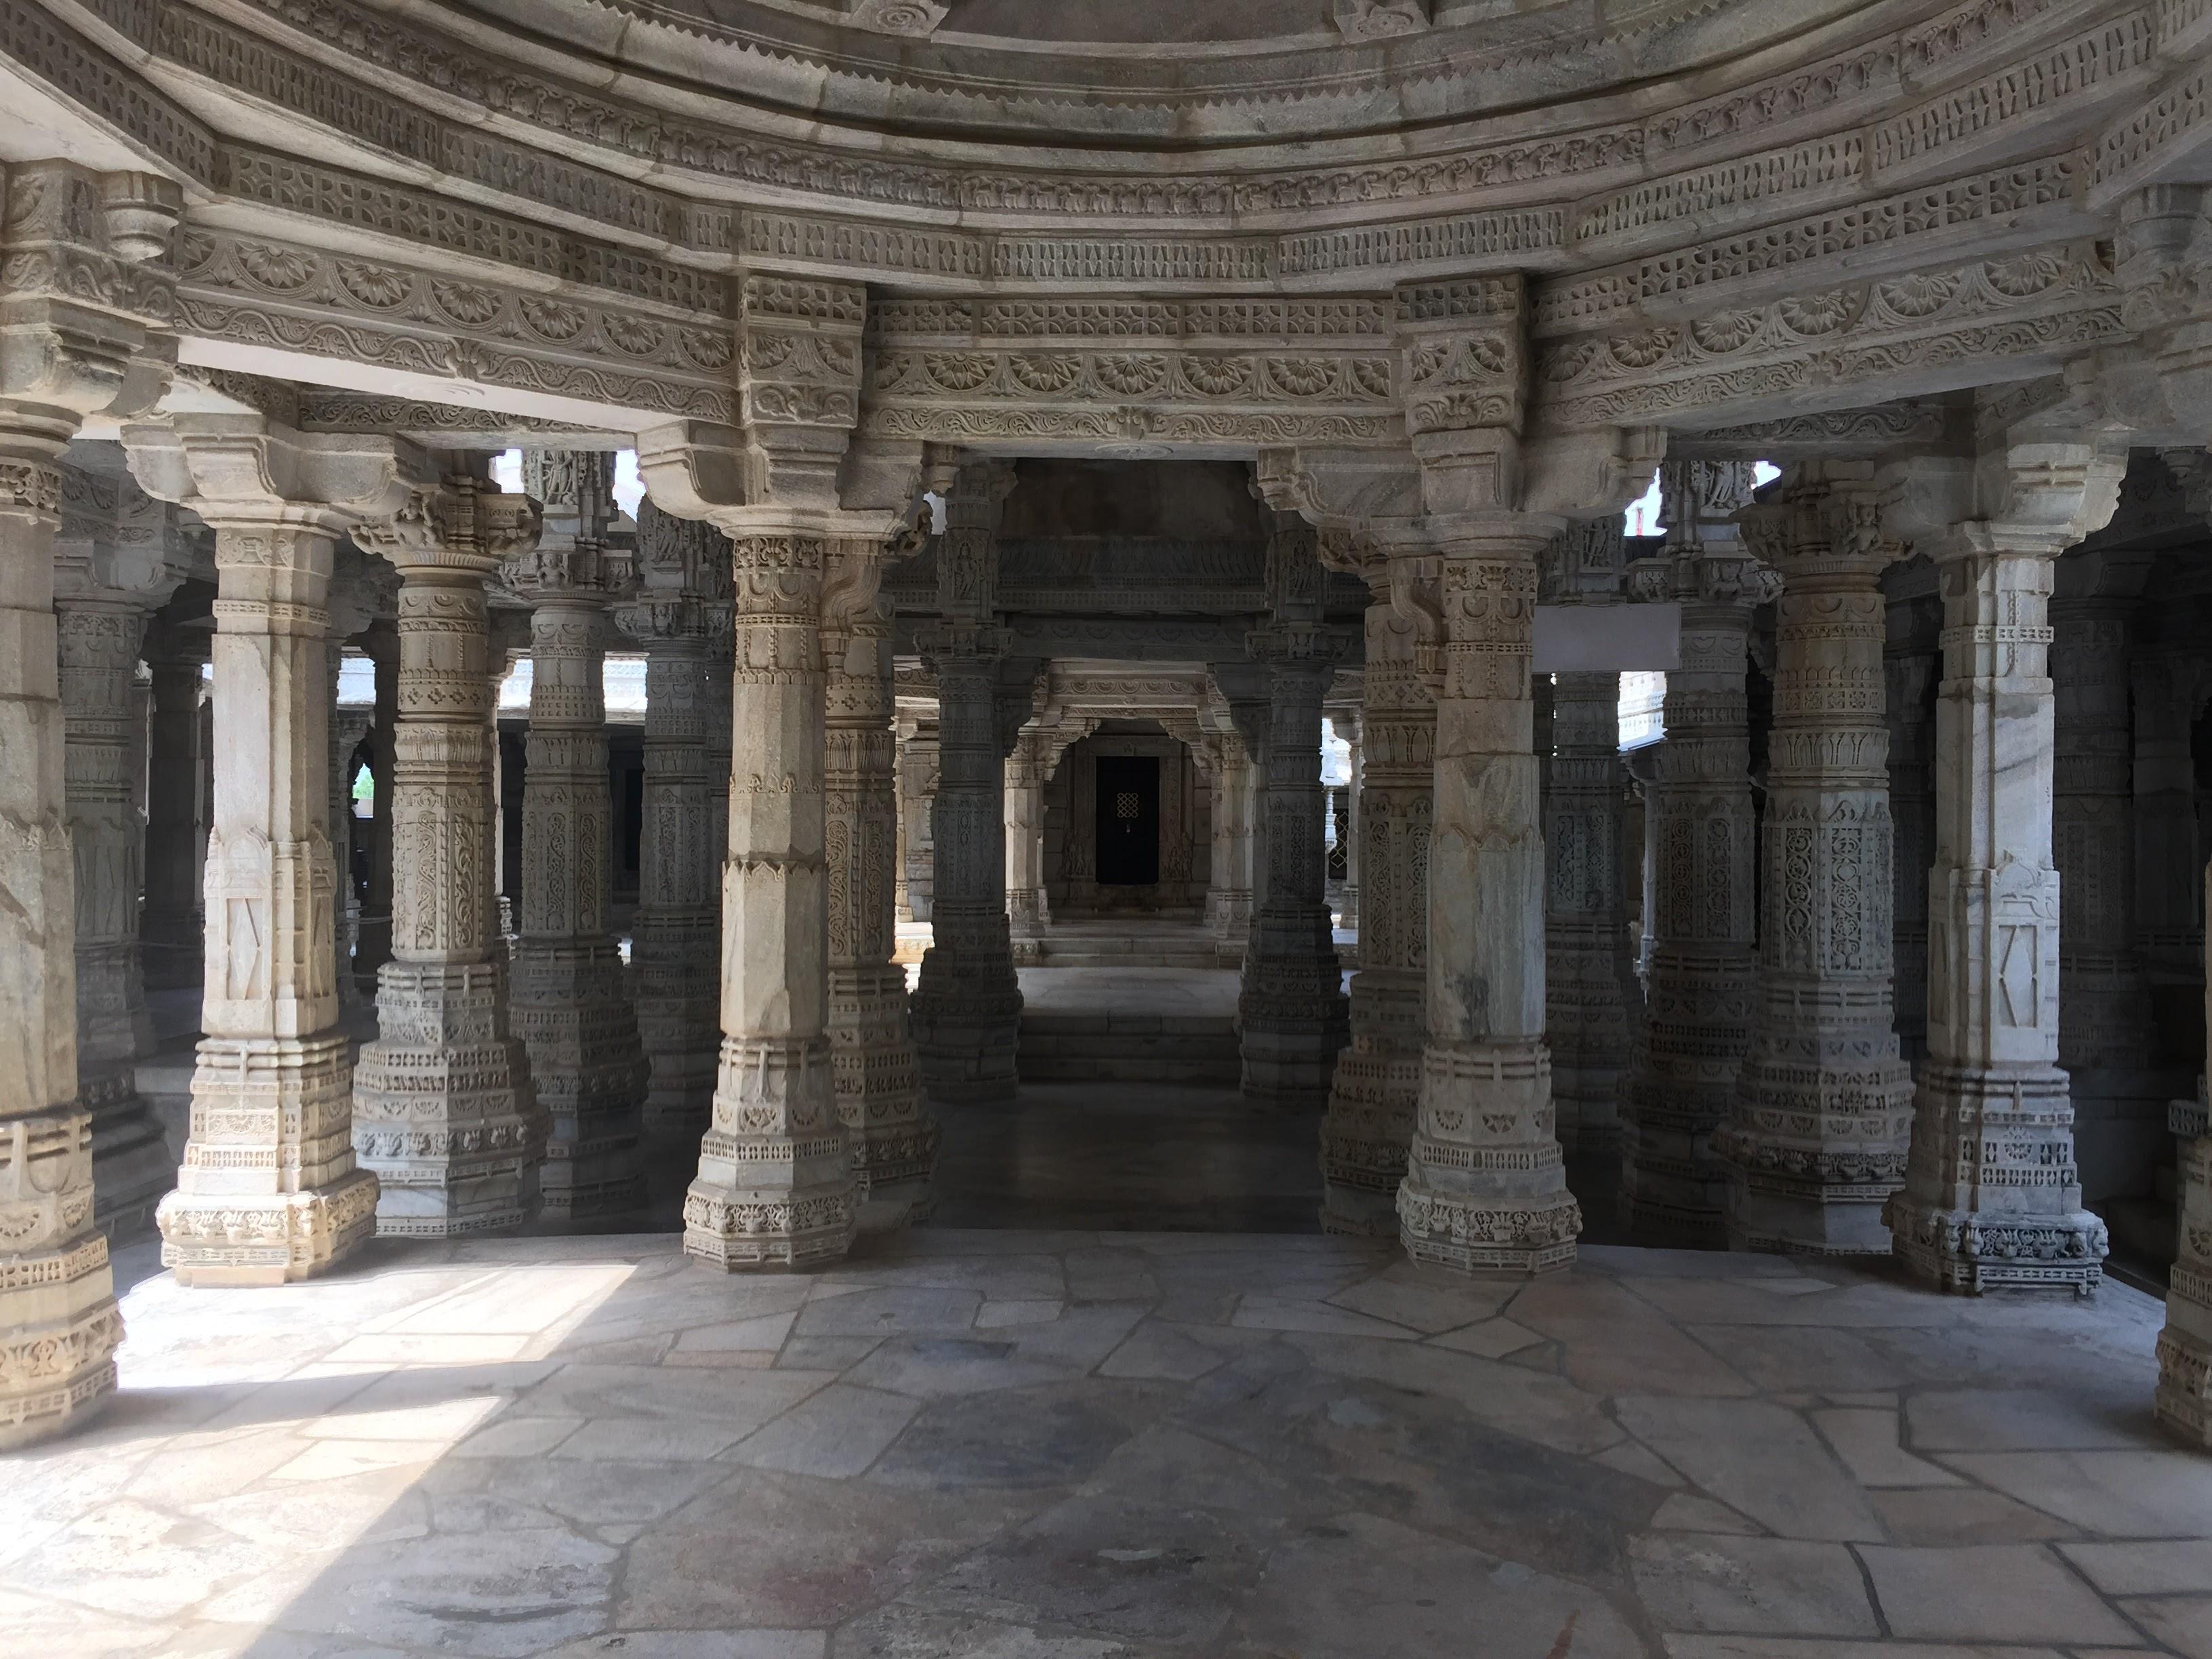 Inside Ranakpur Jain Temple